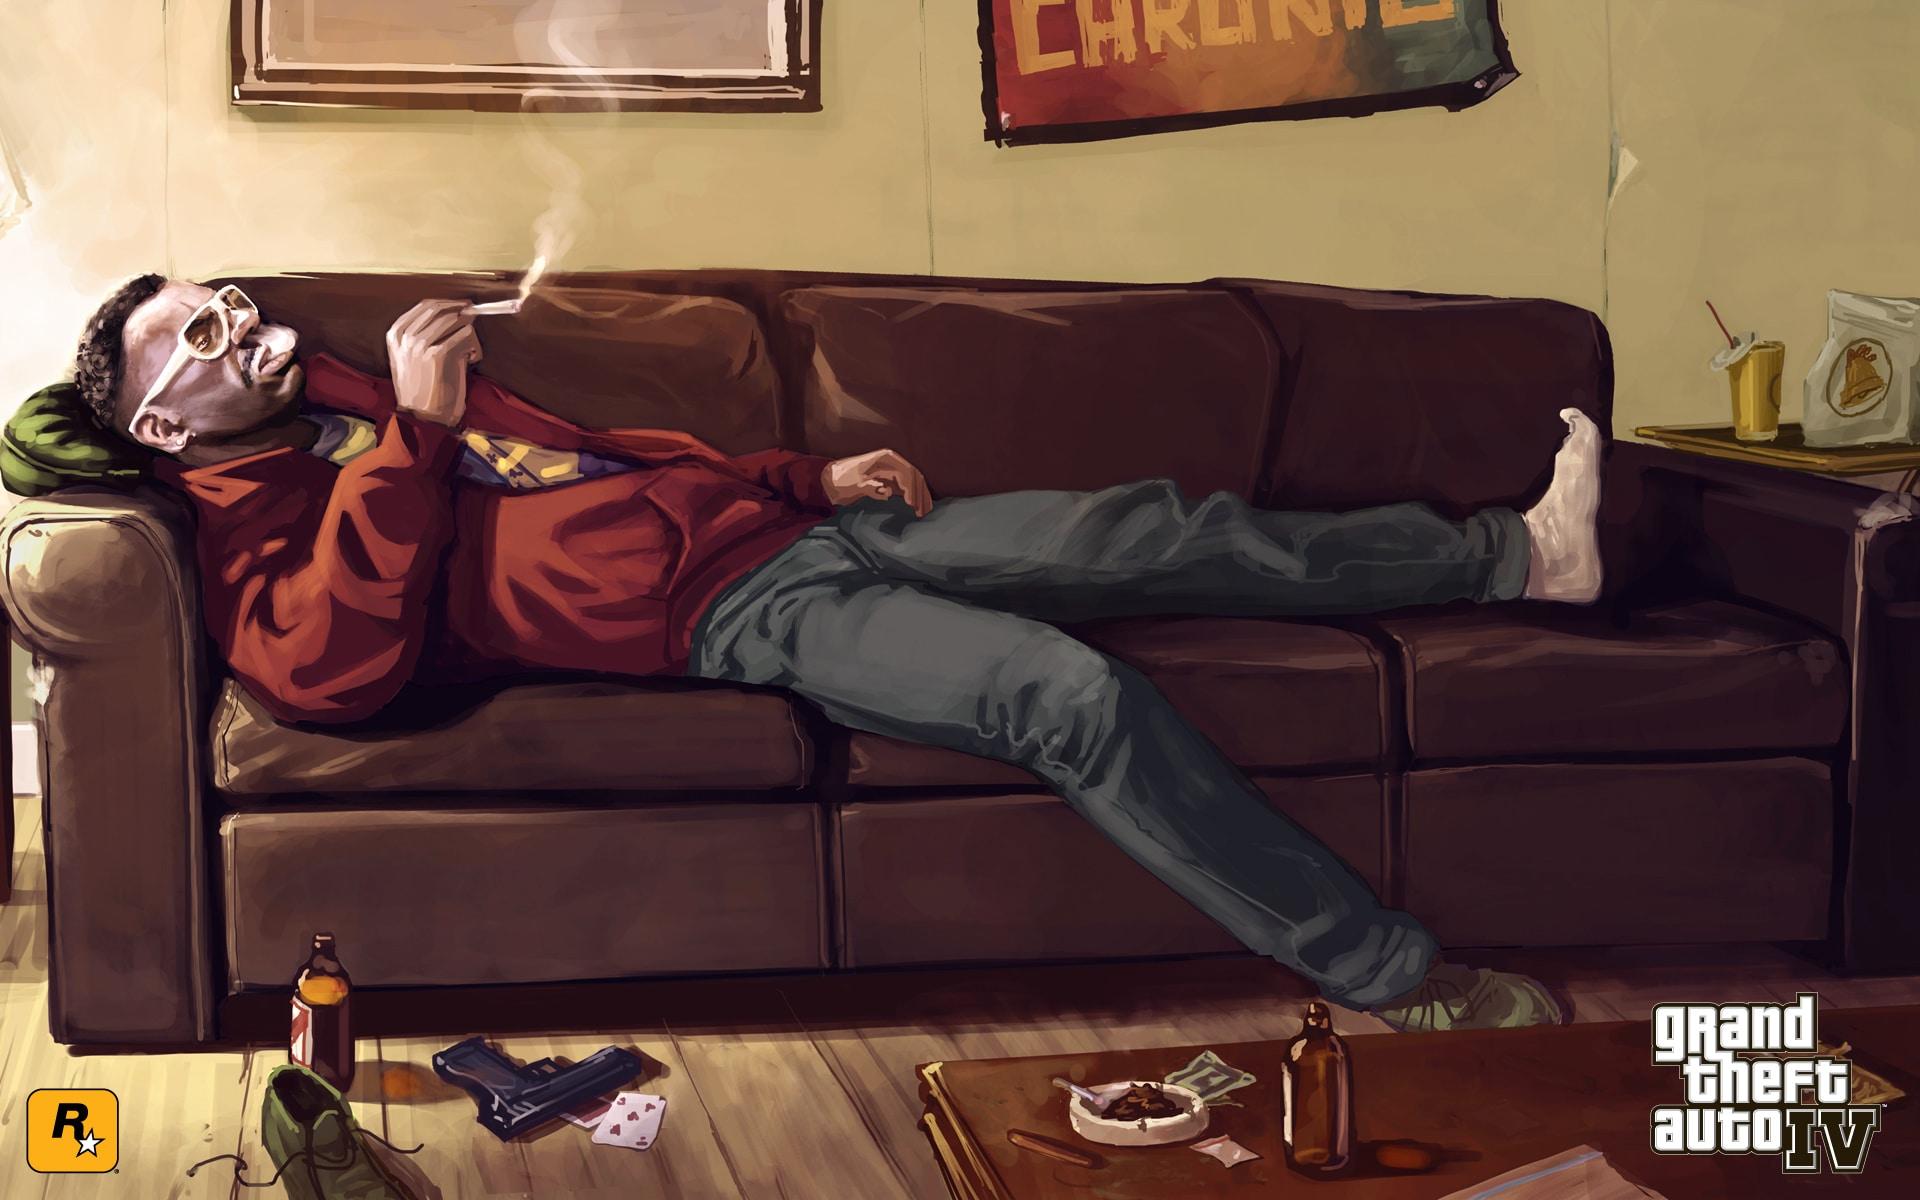 Cheat Happens - Grand Theft Auto 4 Wallpaper